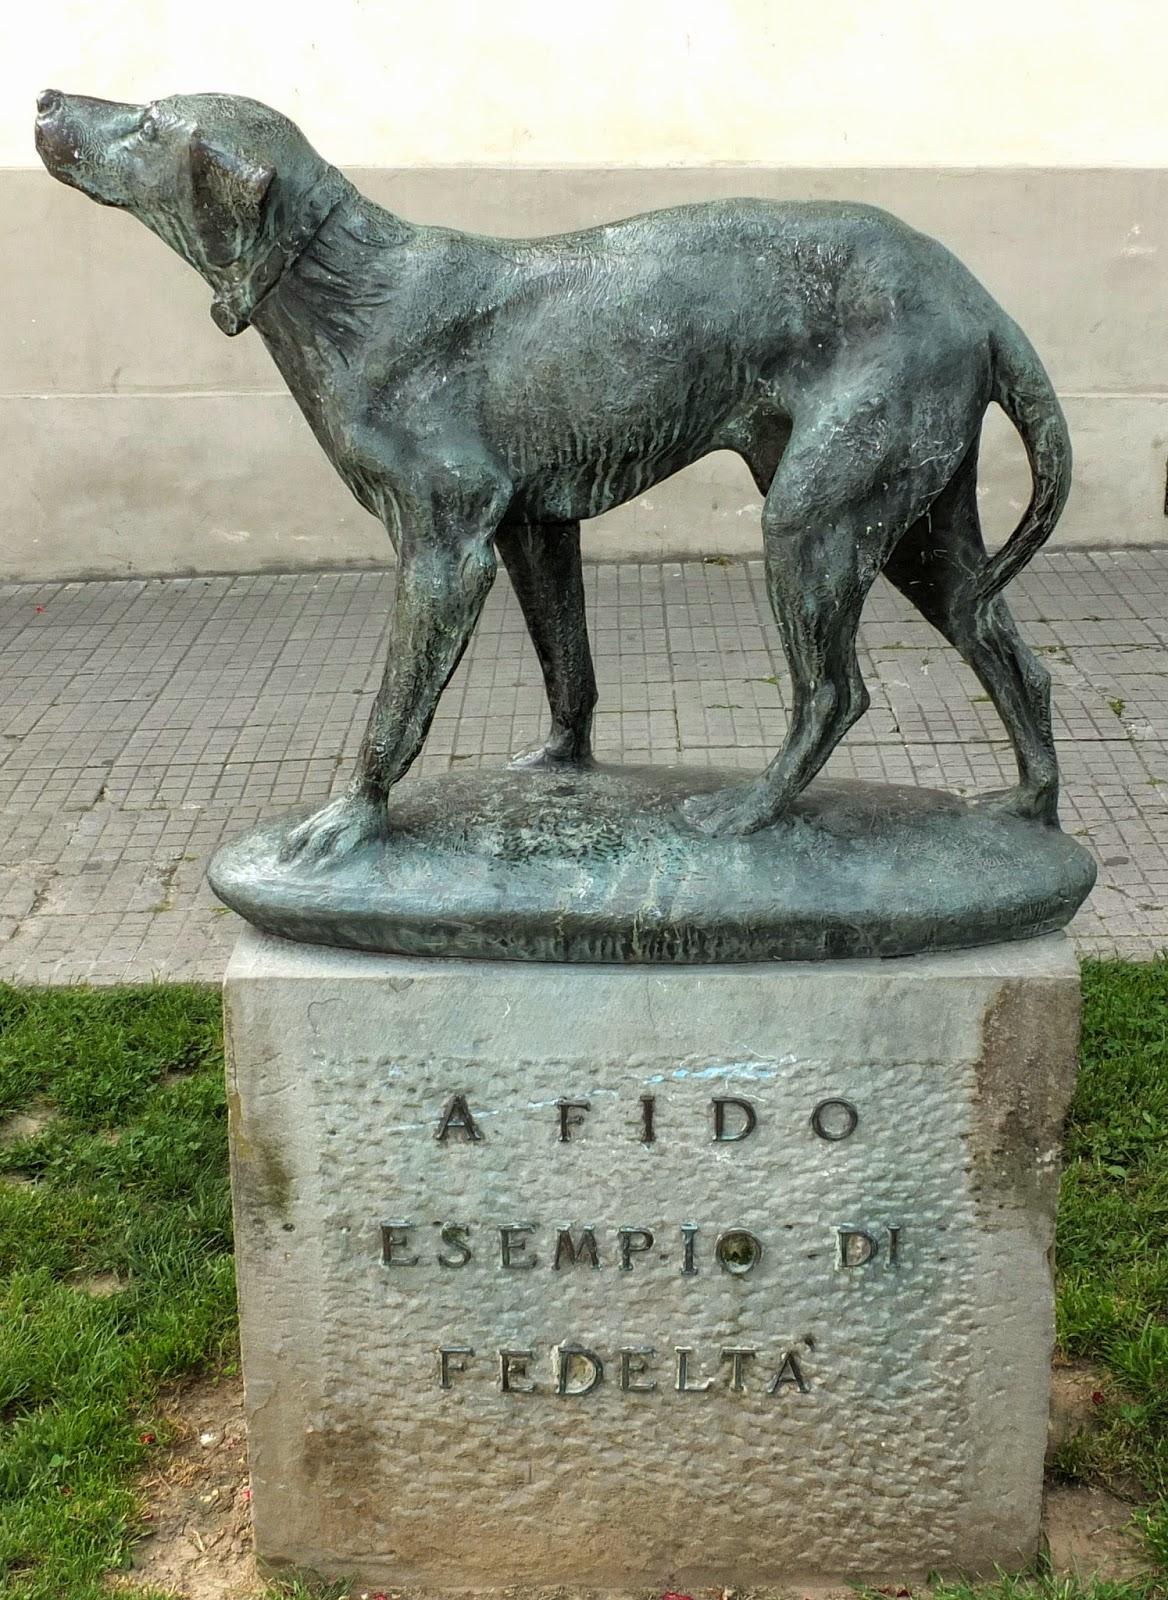 Cani famosi: Fido